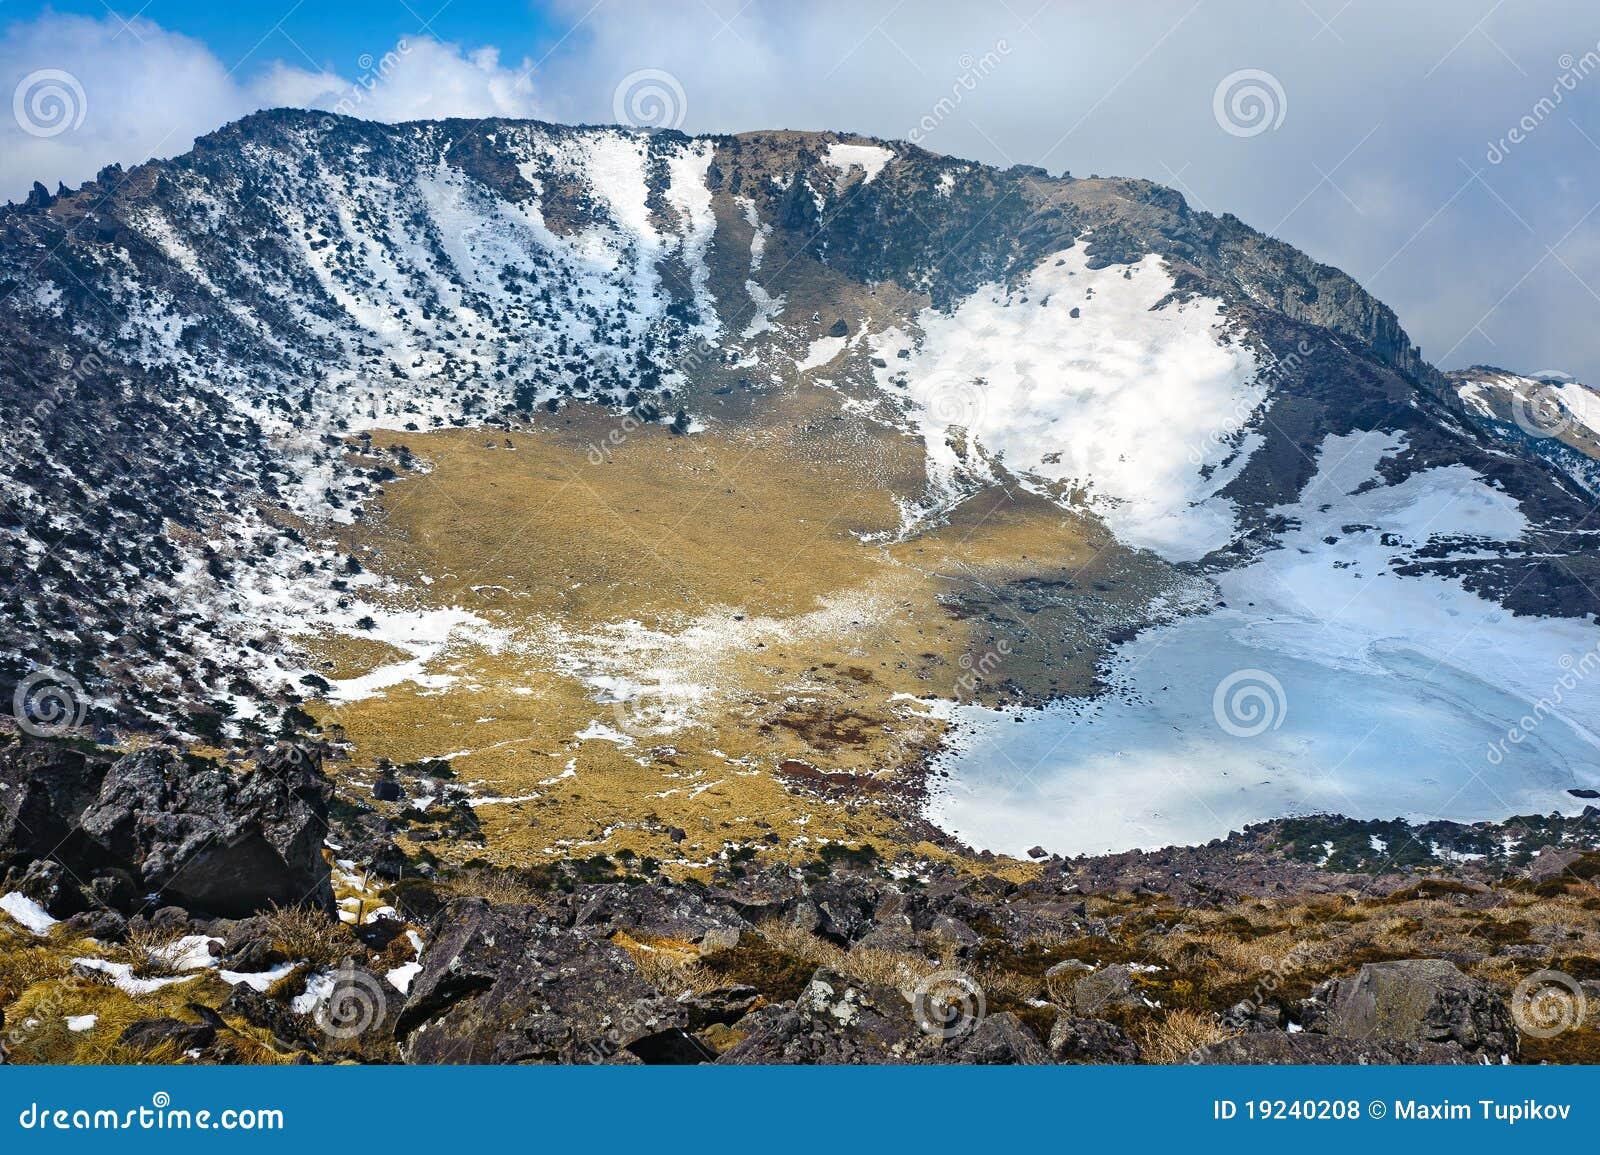 Hallasan mountain volcanic crater